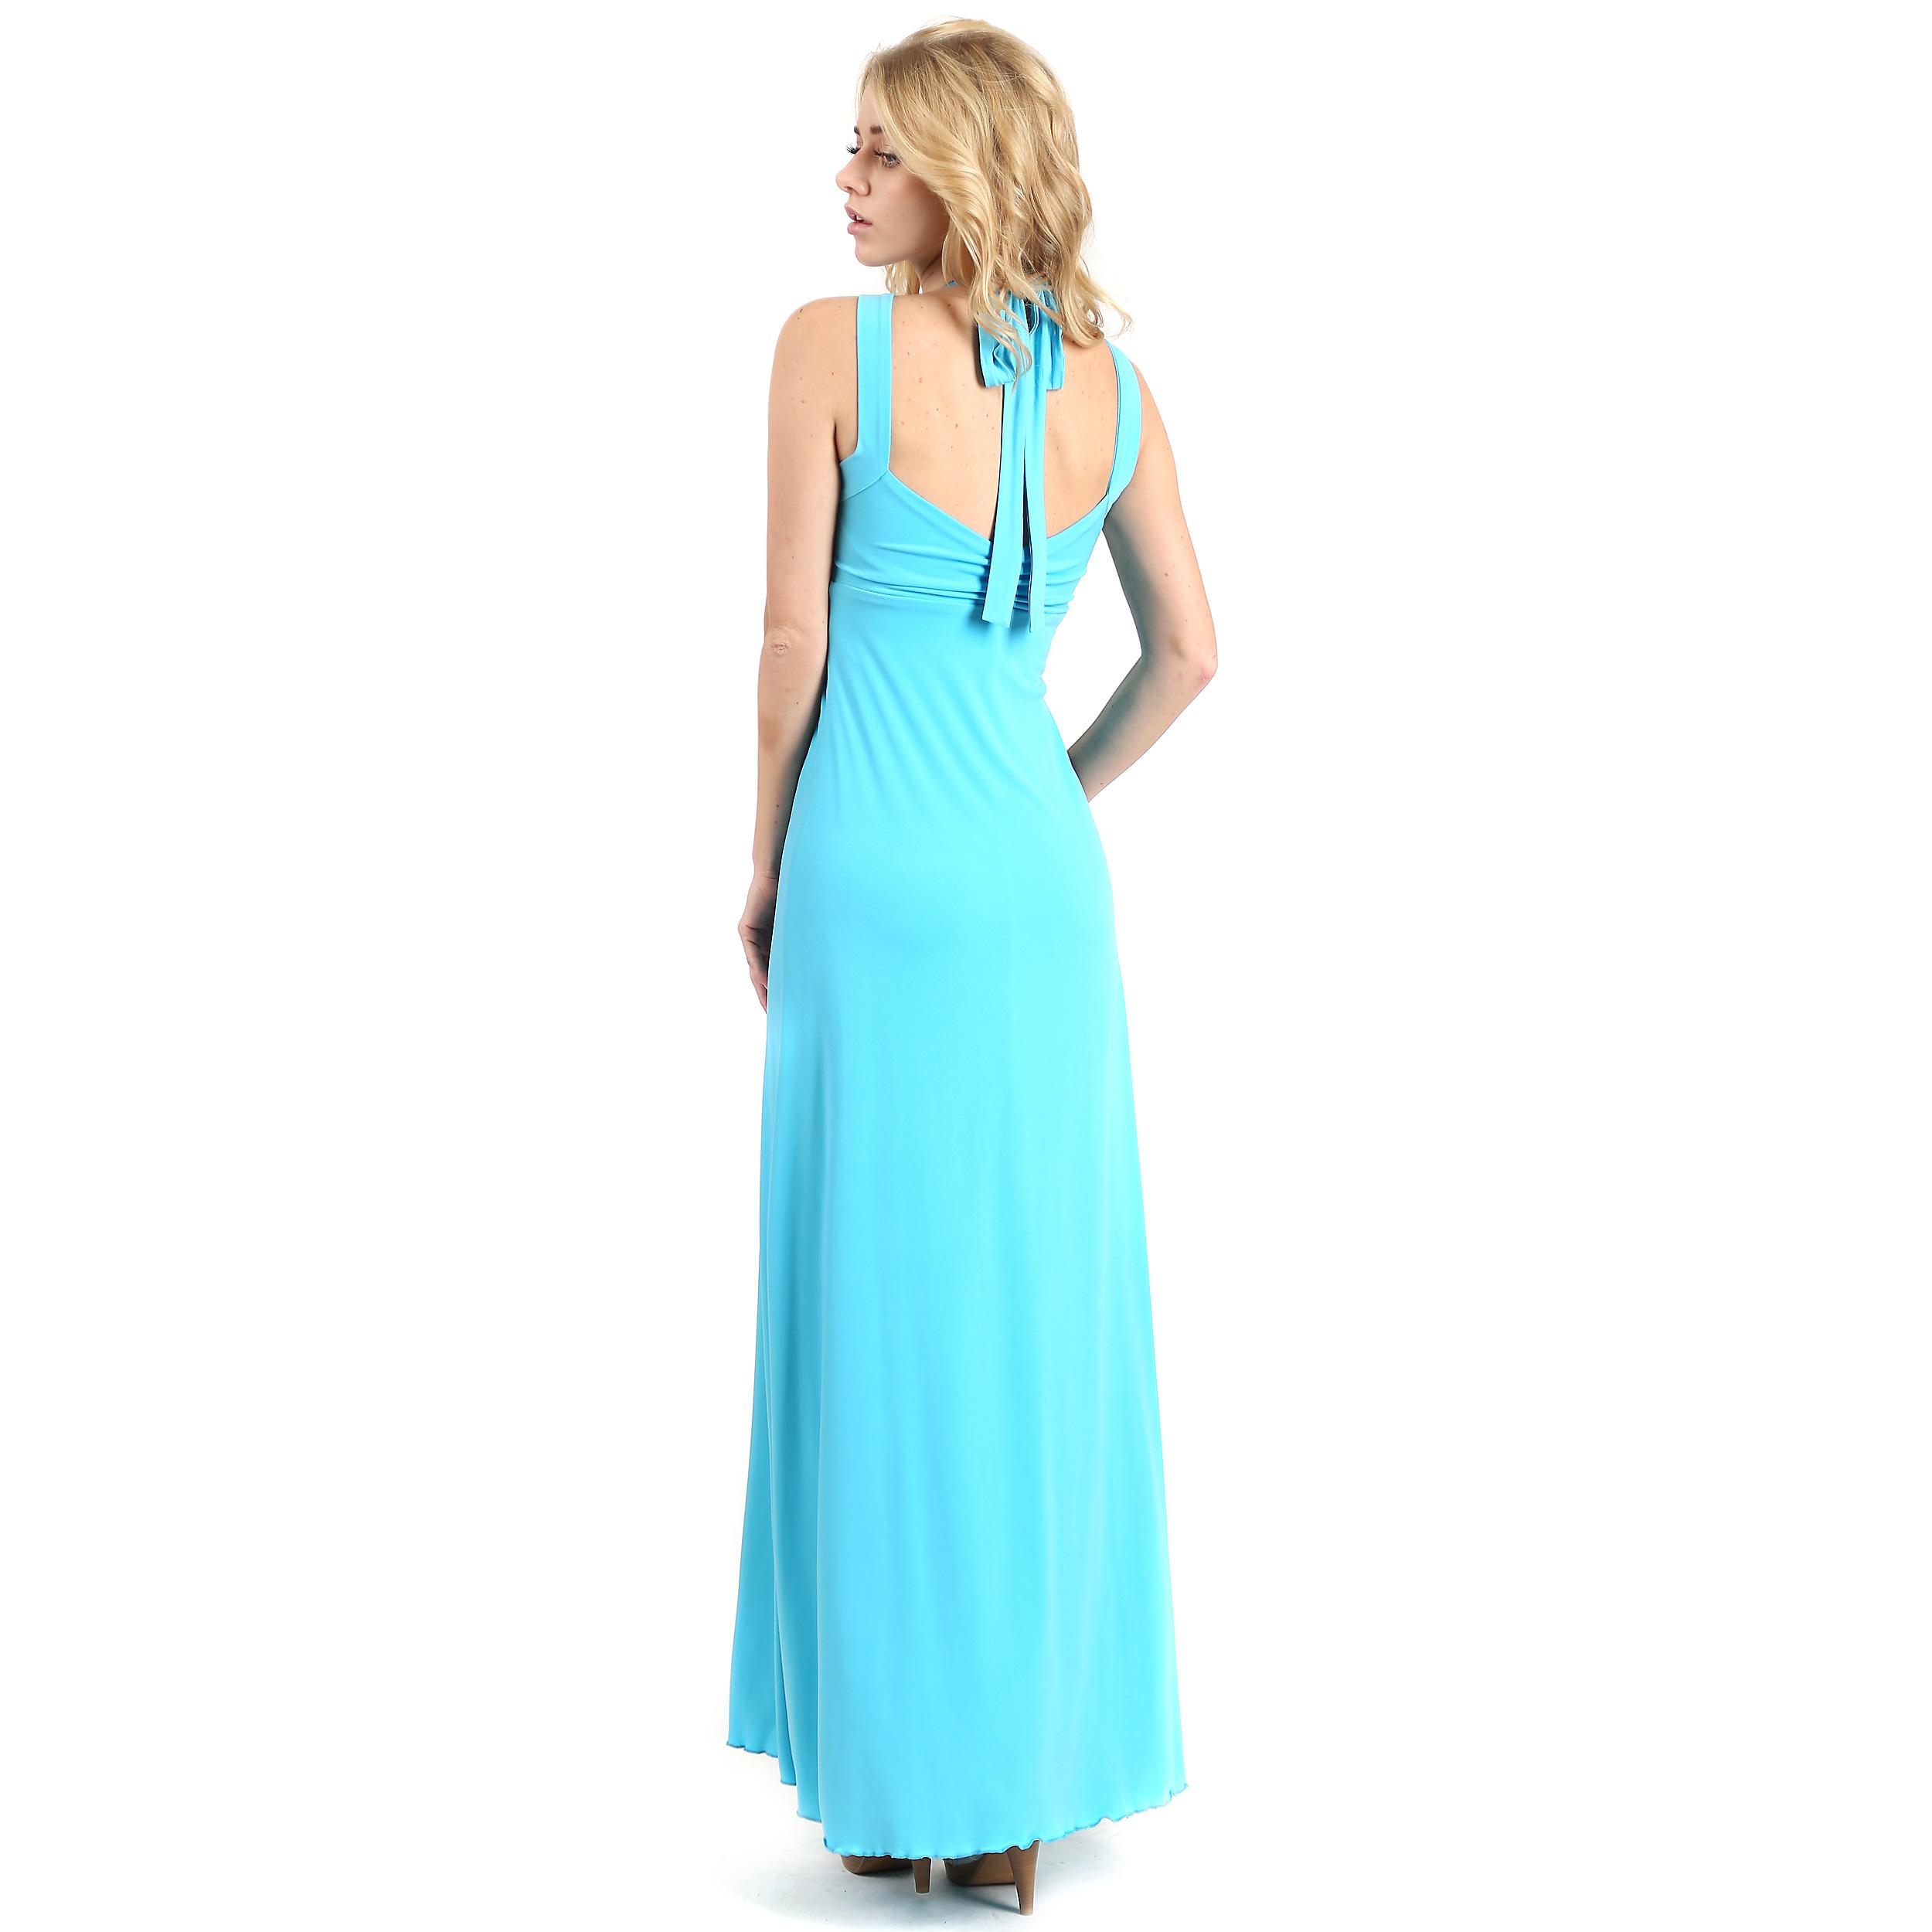 Evanese Women\'s Elegant Cross Tie Halter Long Formal Party Dress ...